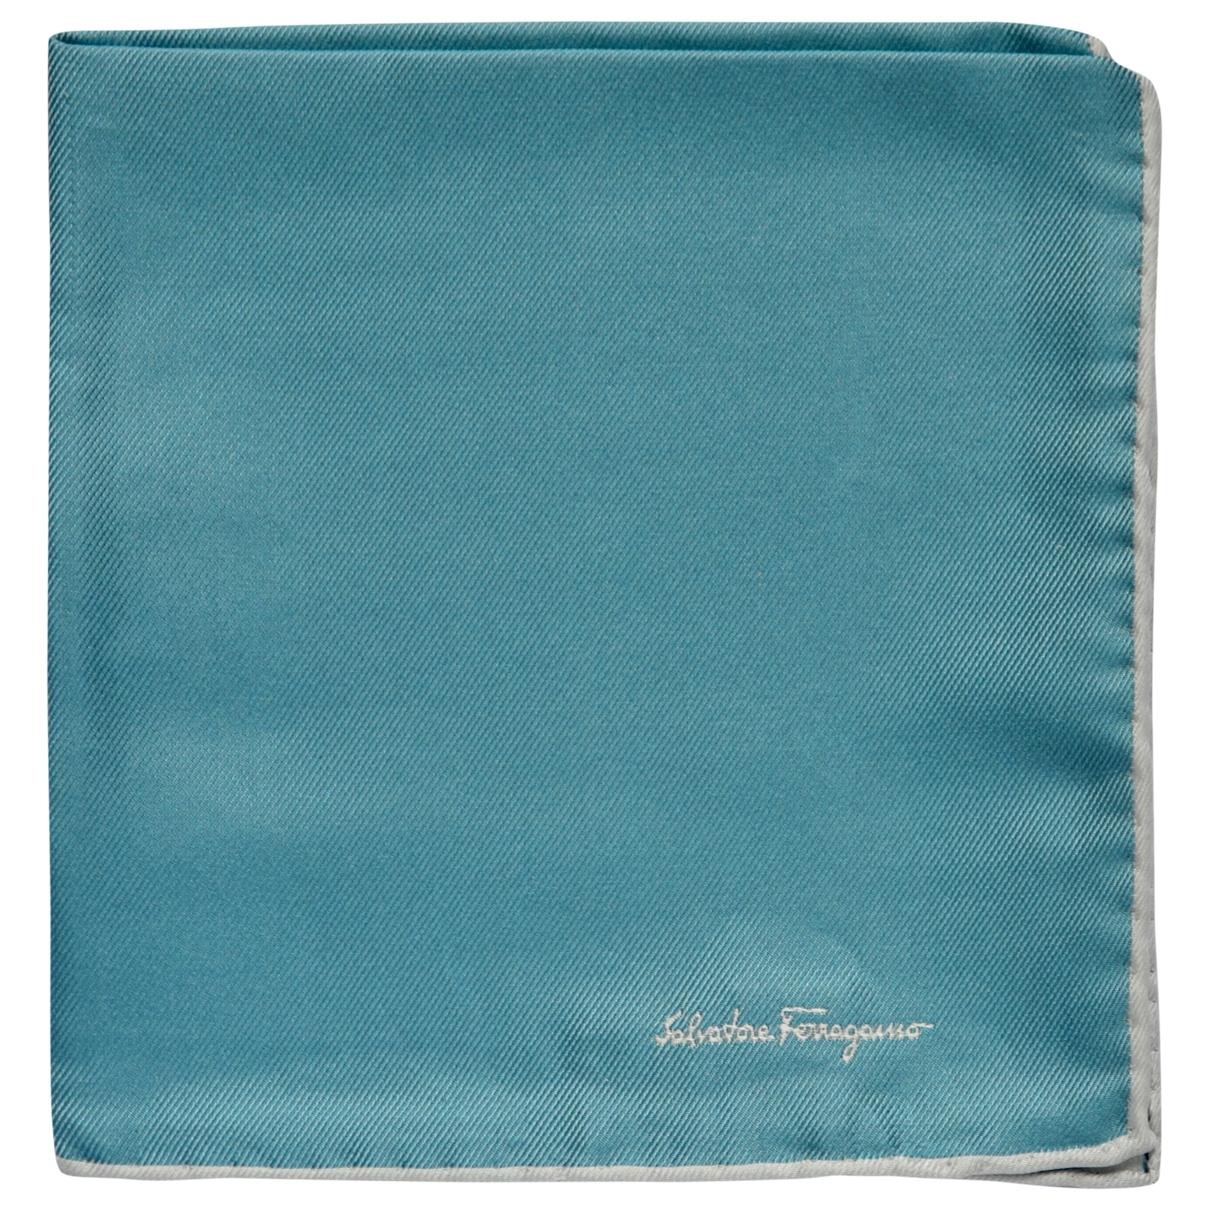 Salvatore Ferragamo \N Blue Silk scarf & pocket squares for Men \N